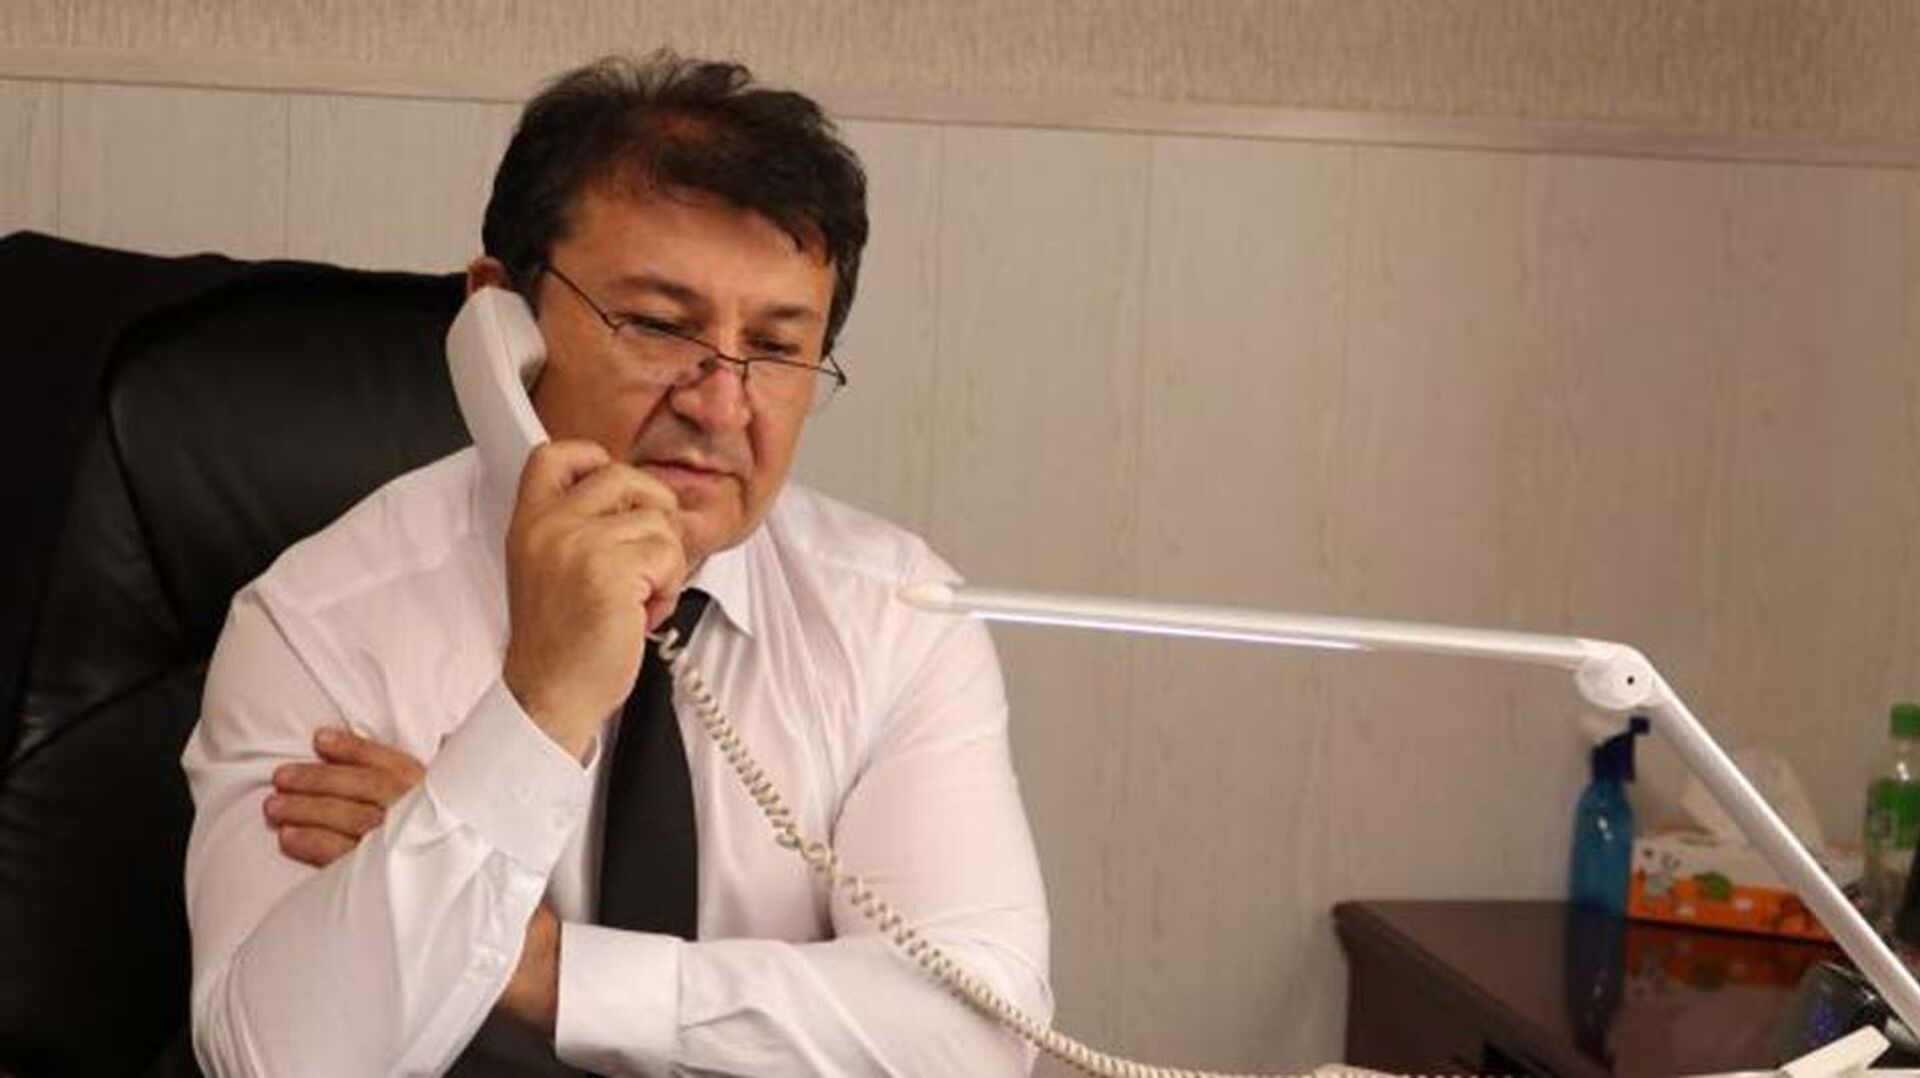 Министр здравоохранения Таджикистана Джамолиддин Абдуллозода - Sputnik Таджикистан, 1920, 04.08.2021